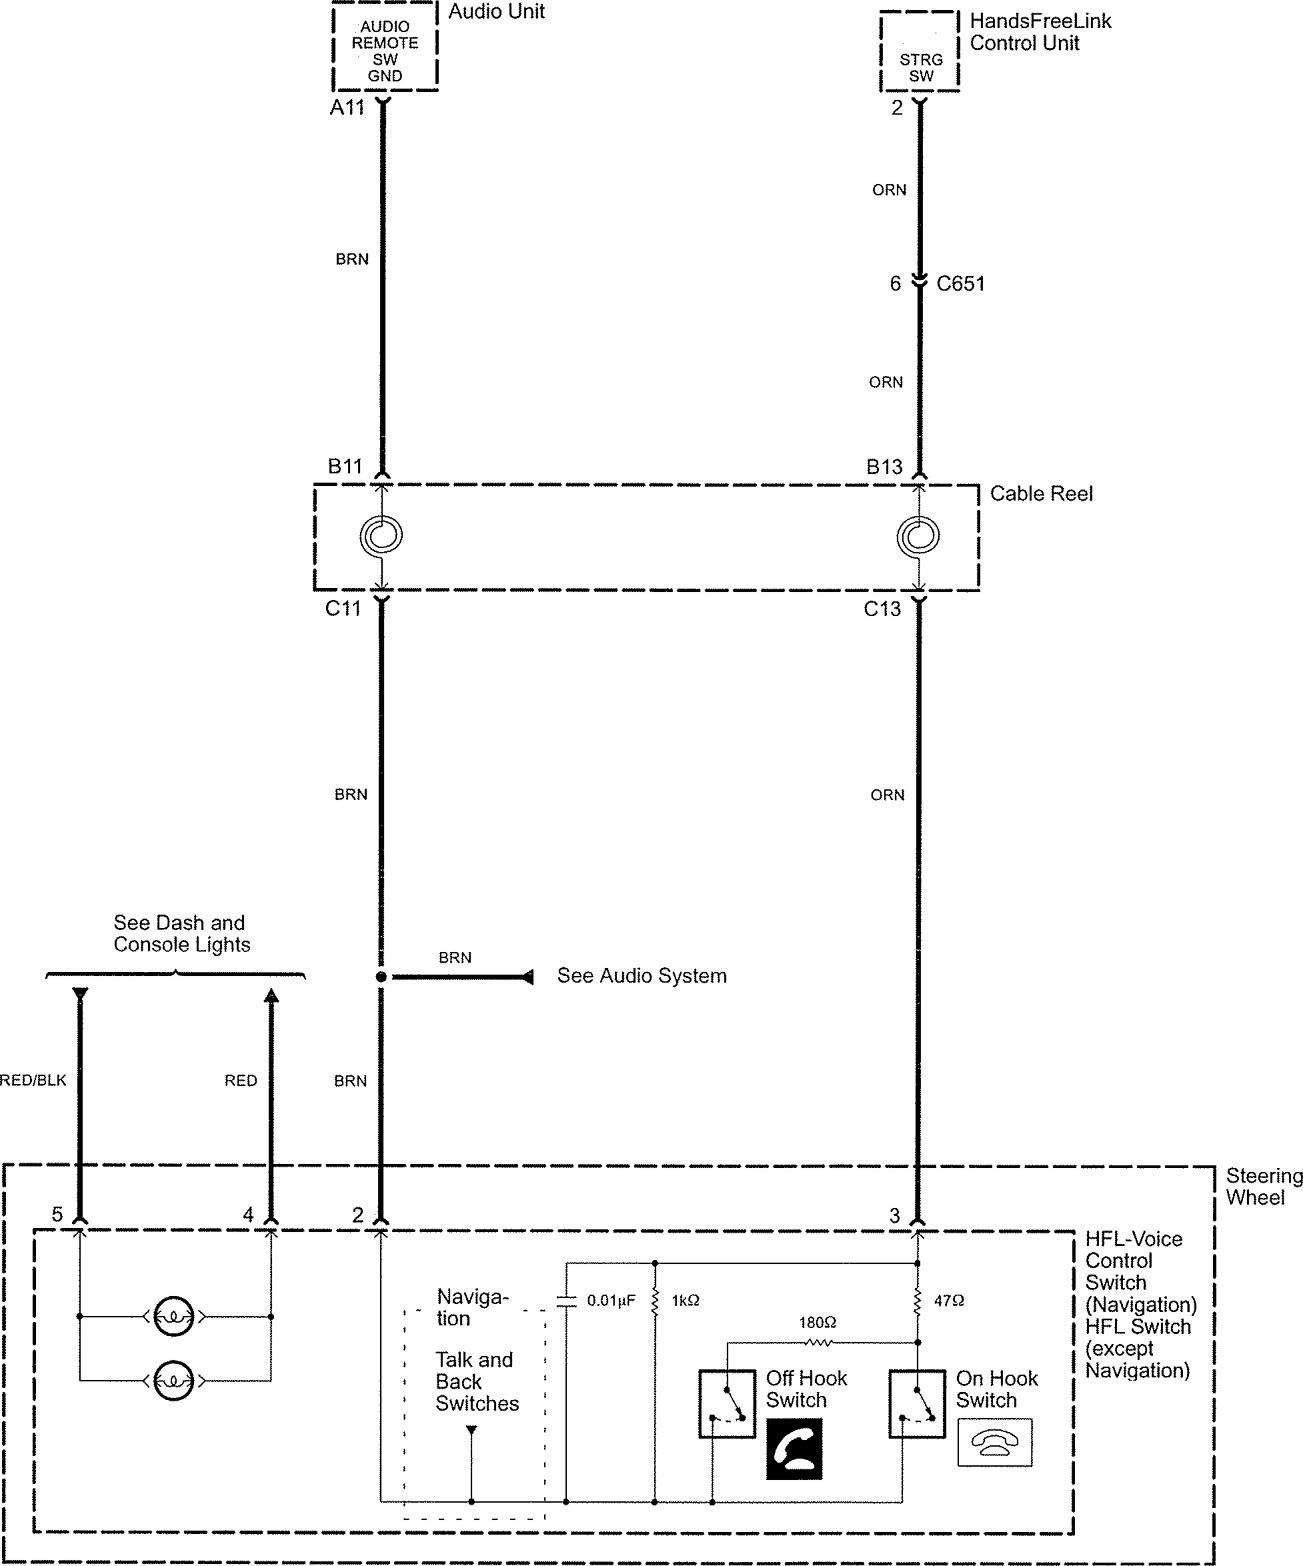 2001 kia spectra fuse box diagram fuse box kia sephia 1996 pro wiring diagram  fuse box kia sephia 1996 pro wiring